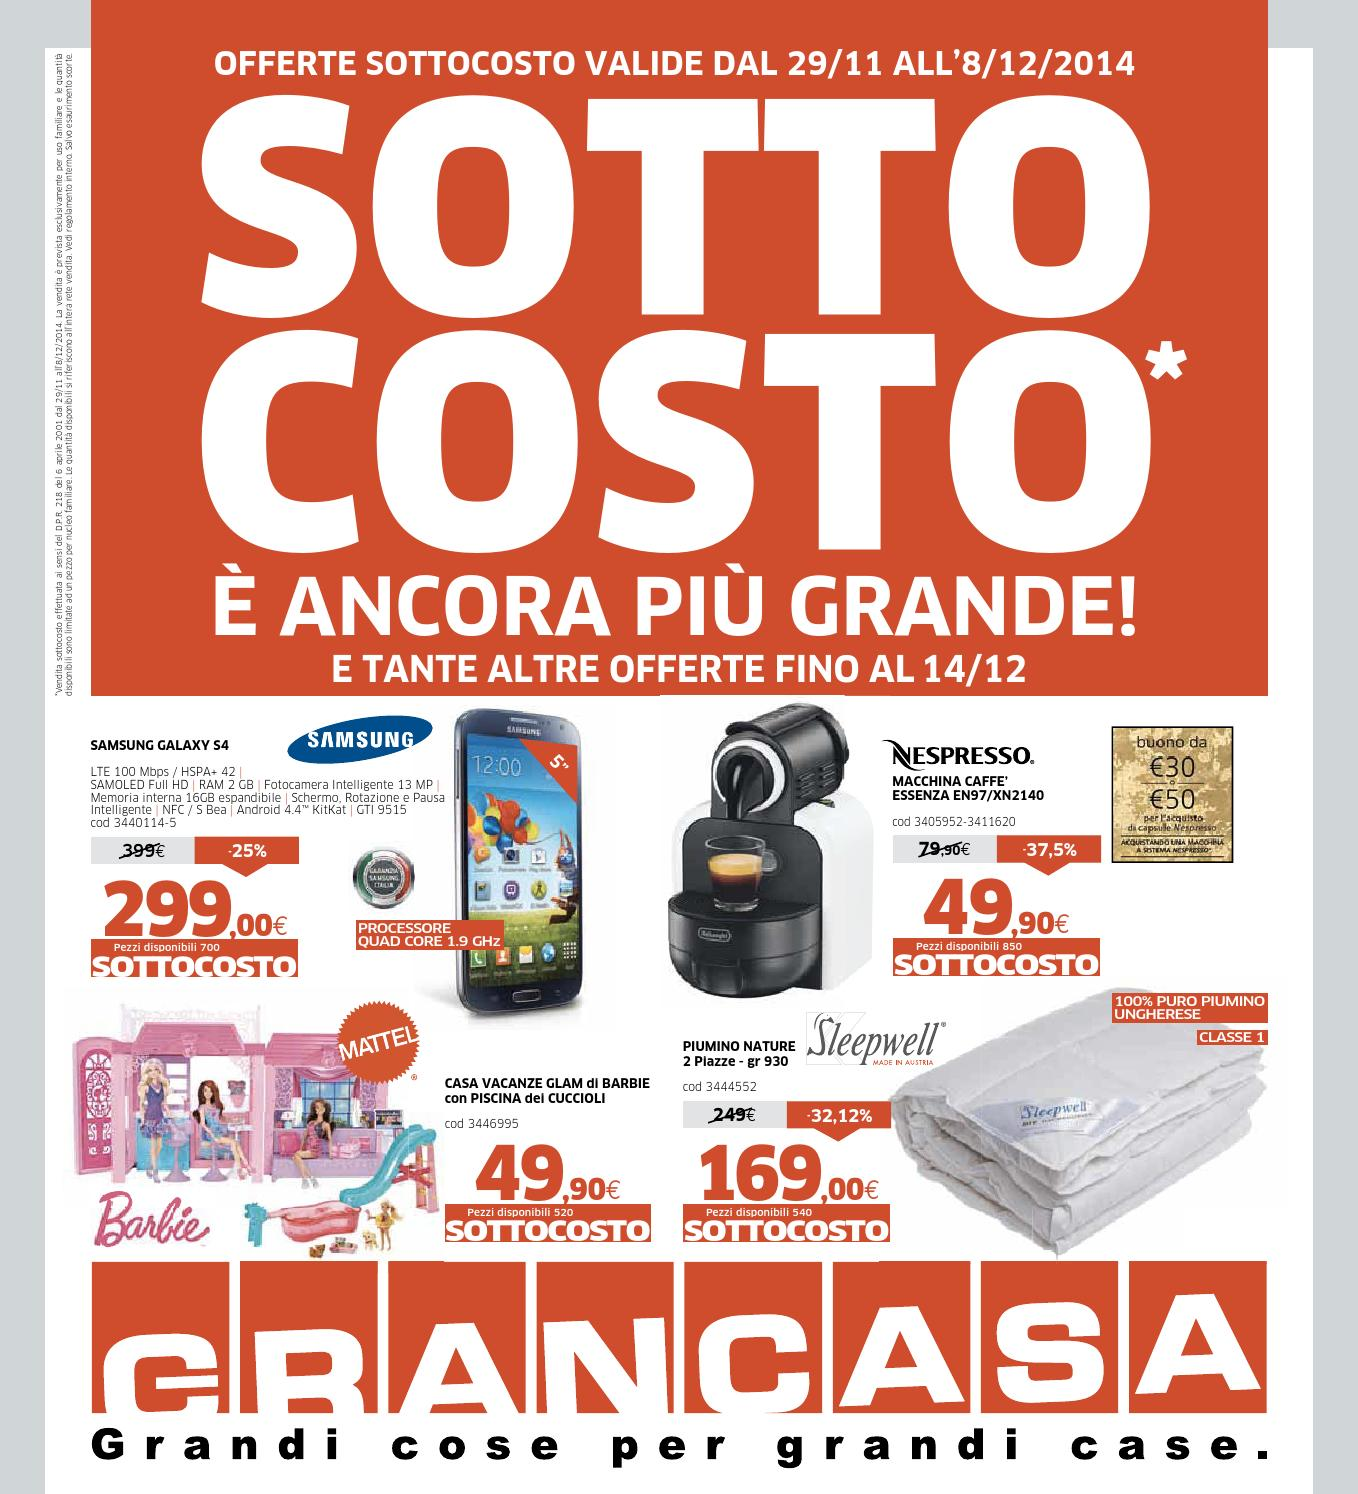 grancasa 8dic by volavolantino - issuu - Grancasa Mantova Volantino